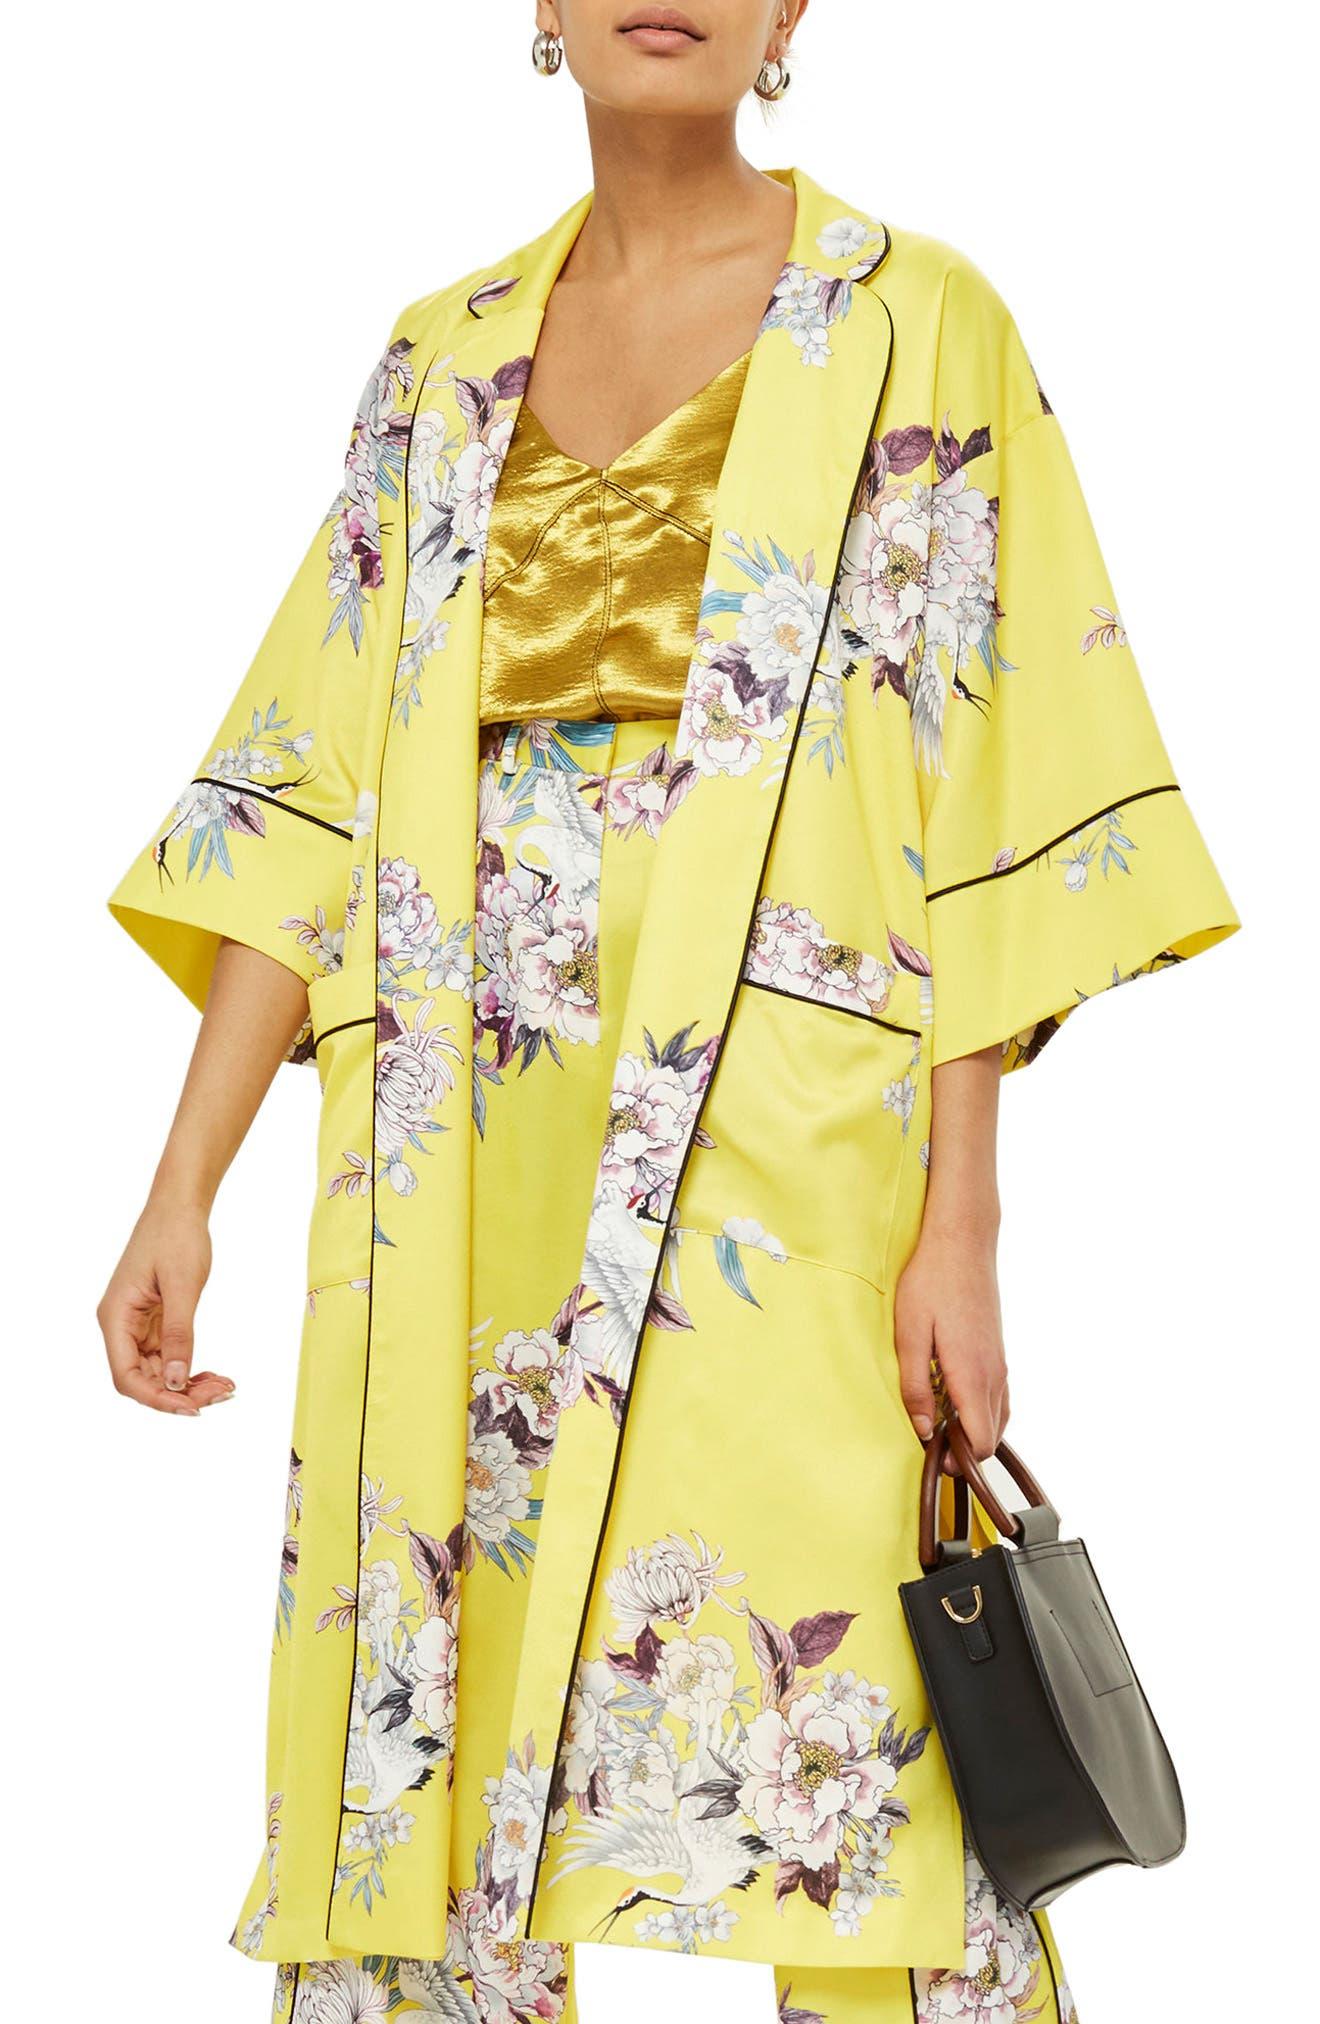 Heron Print Kimono,                             Main thumbnail 1, color,